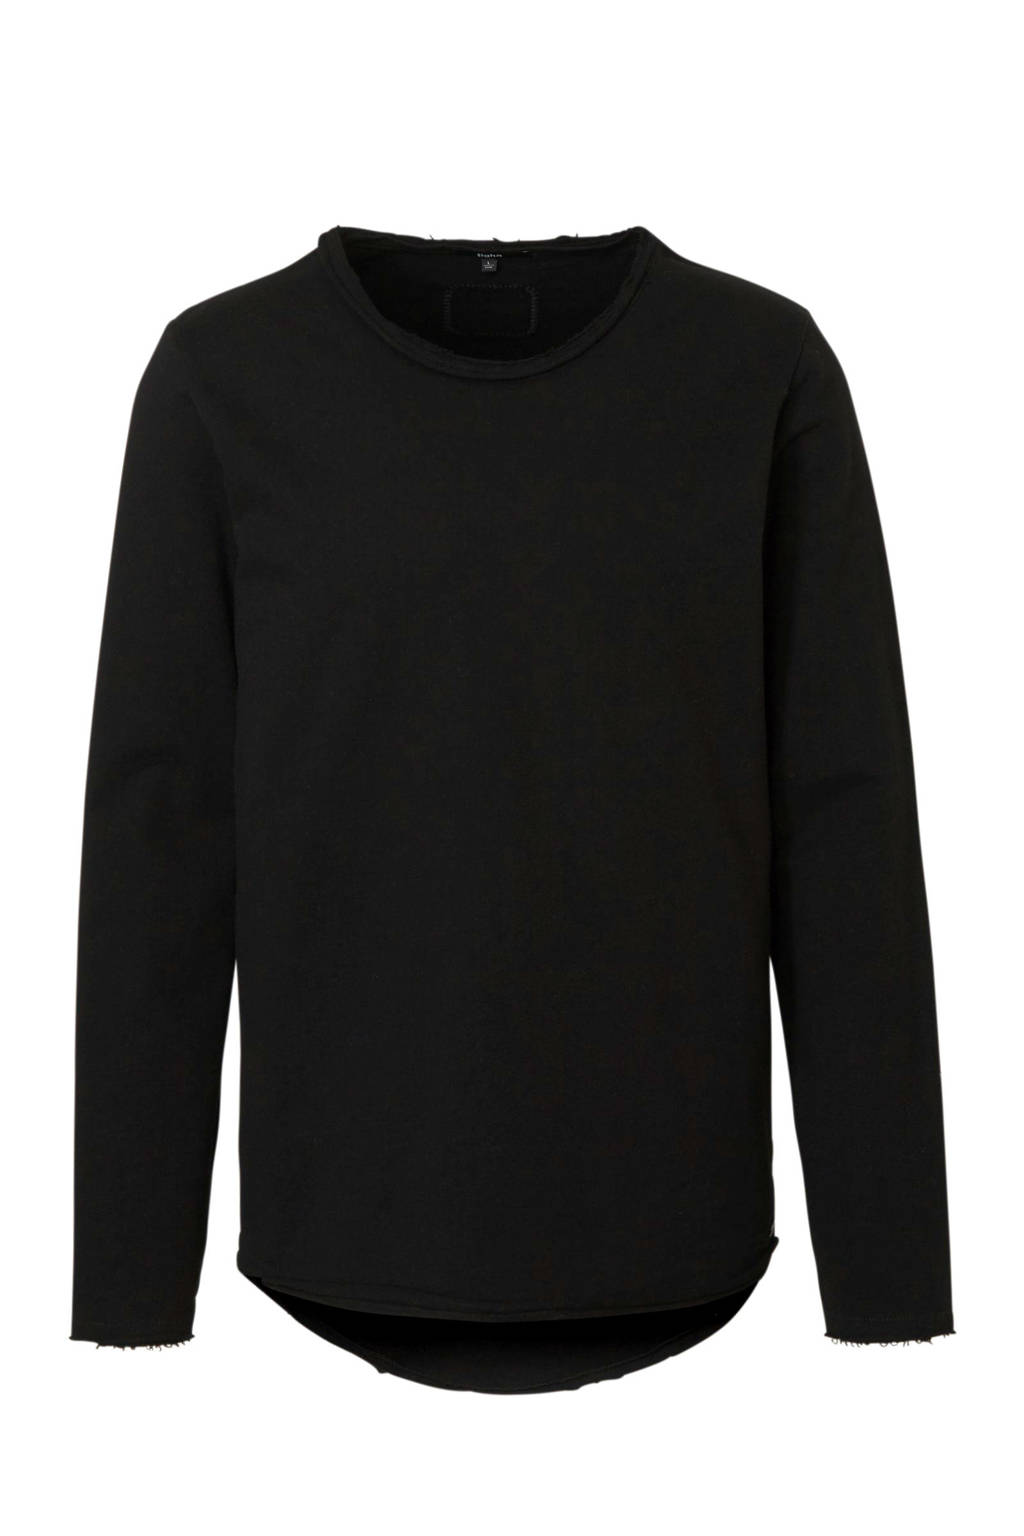 Tigha trui Milo zwart, Zwart